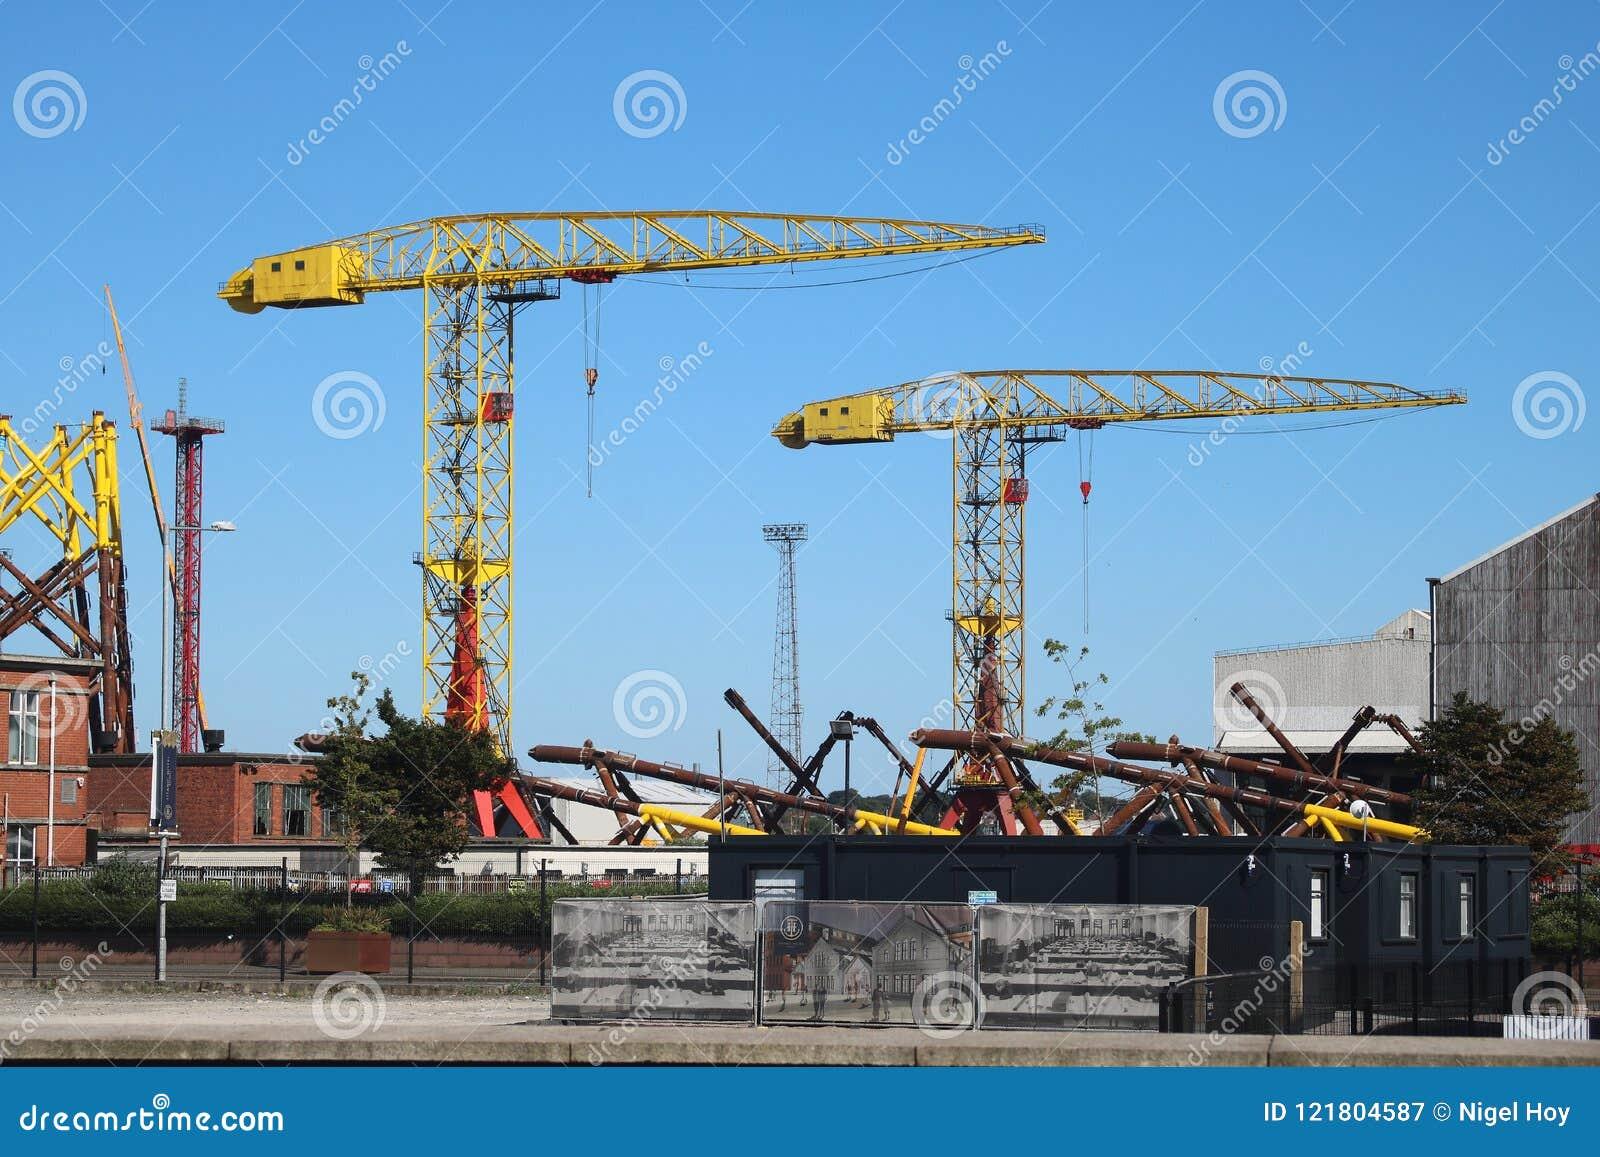 Tall cranes in shipbuilding yard